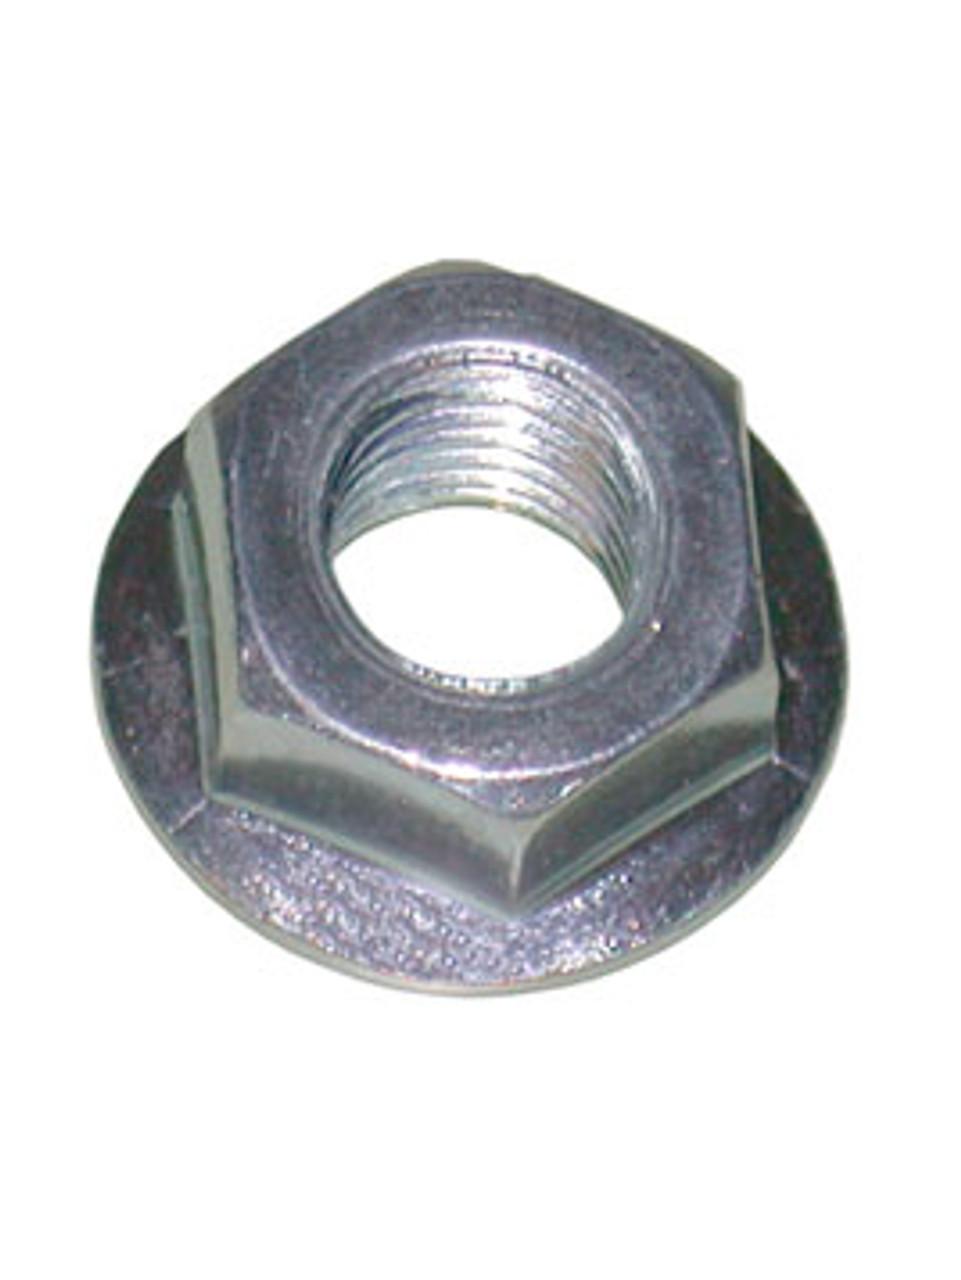 6-92-1 --- Flanged Lock Nut